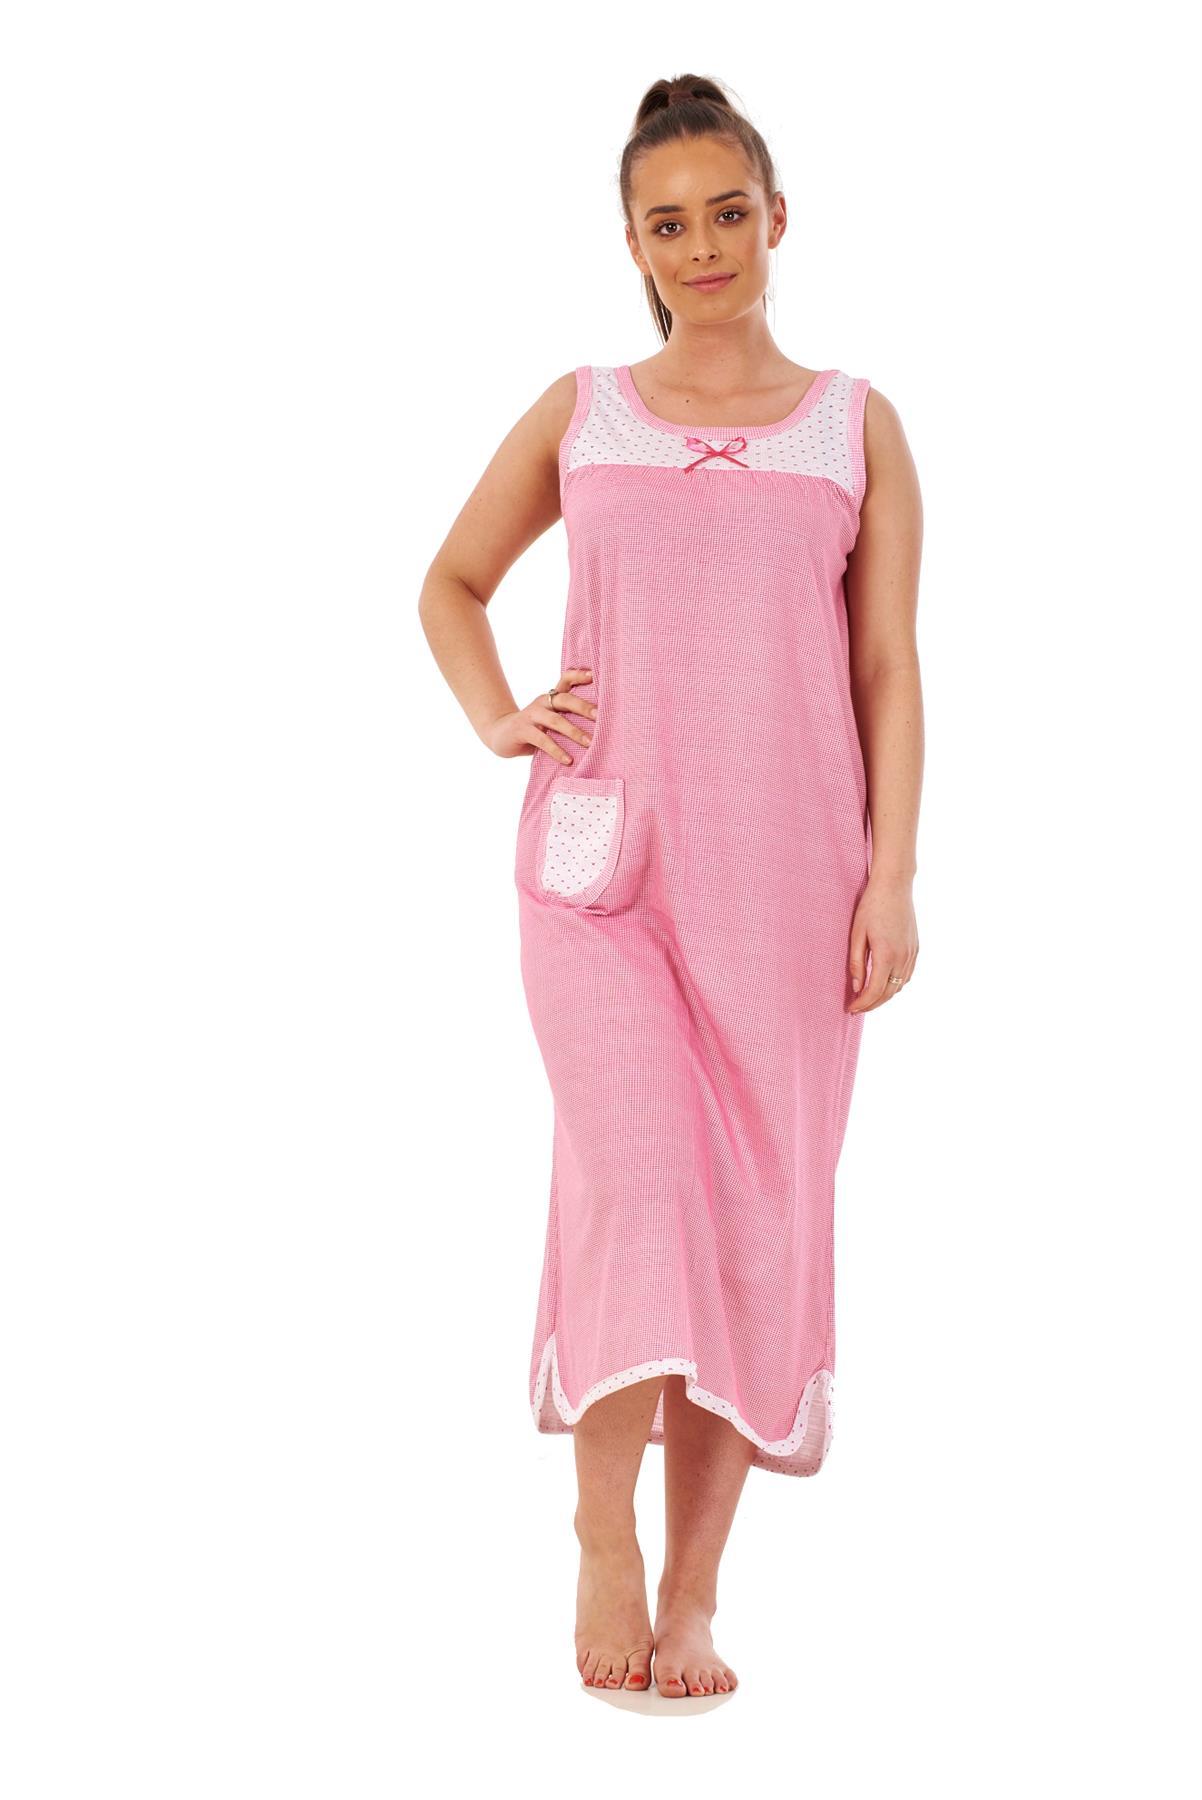 Ladies Nightwear Check 100/% Cotton Sleeveless Crew Neck Long Nightdress M to 3XL